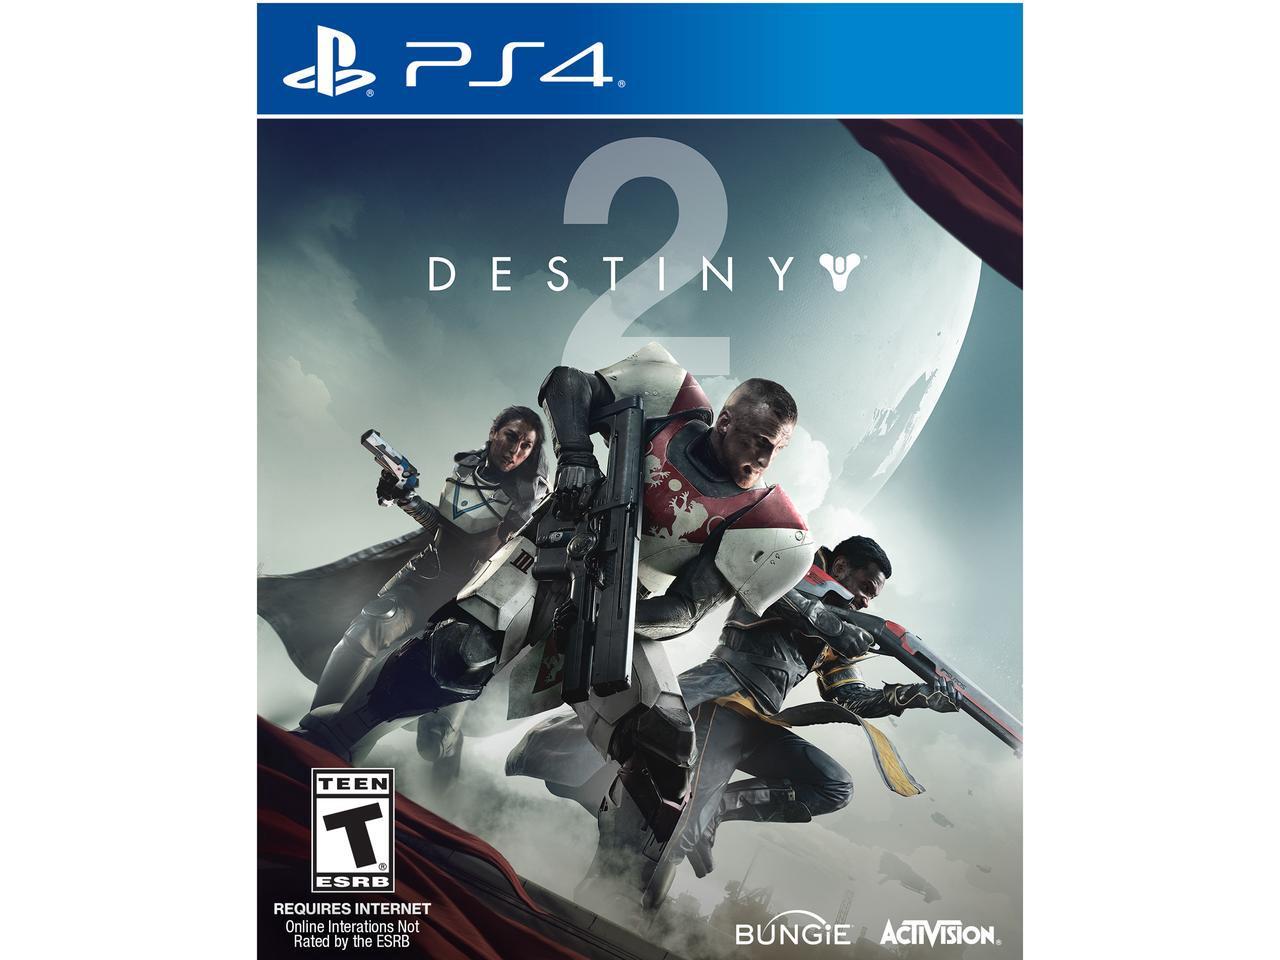 Destiny 2 PS4 + Dualshock 4 Controller $80